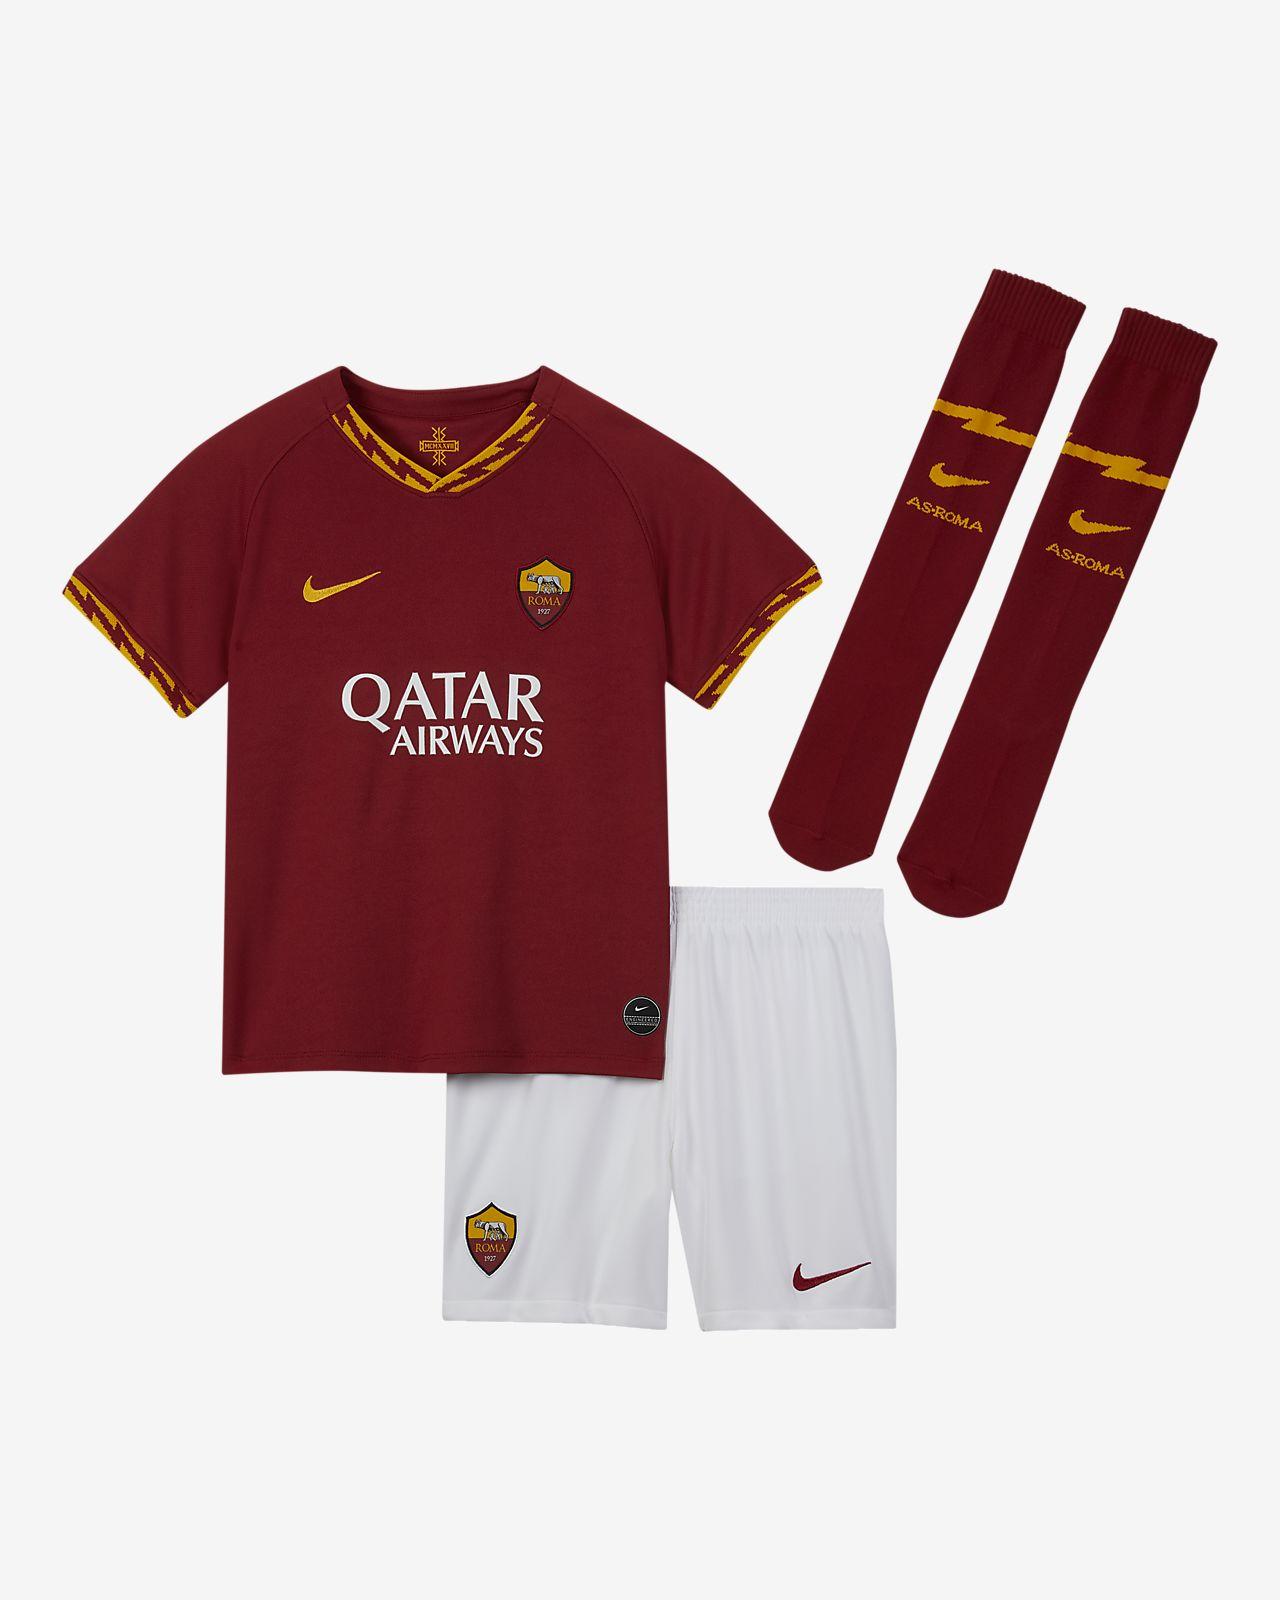 A.S. Roma 2018/19 Home-fodboldsæt til små børn